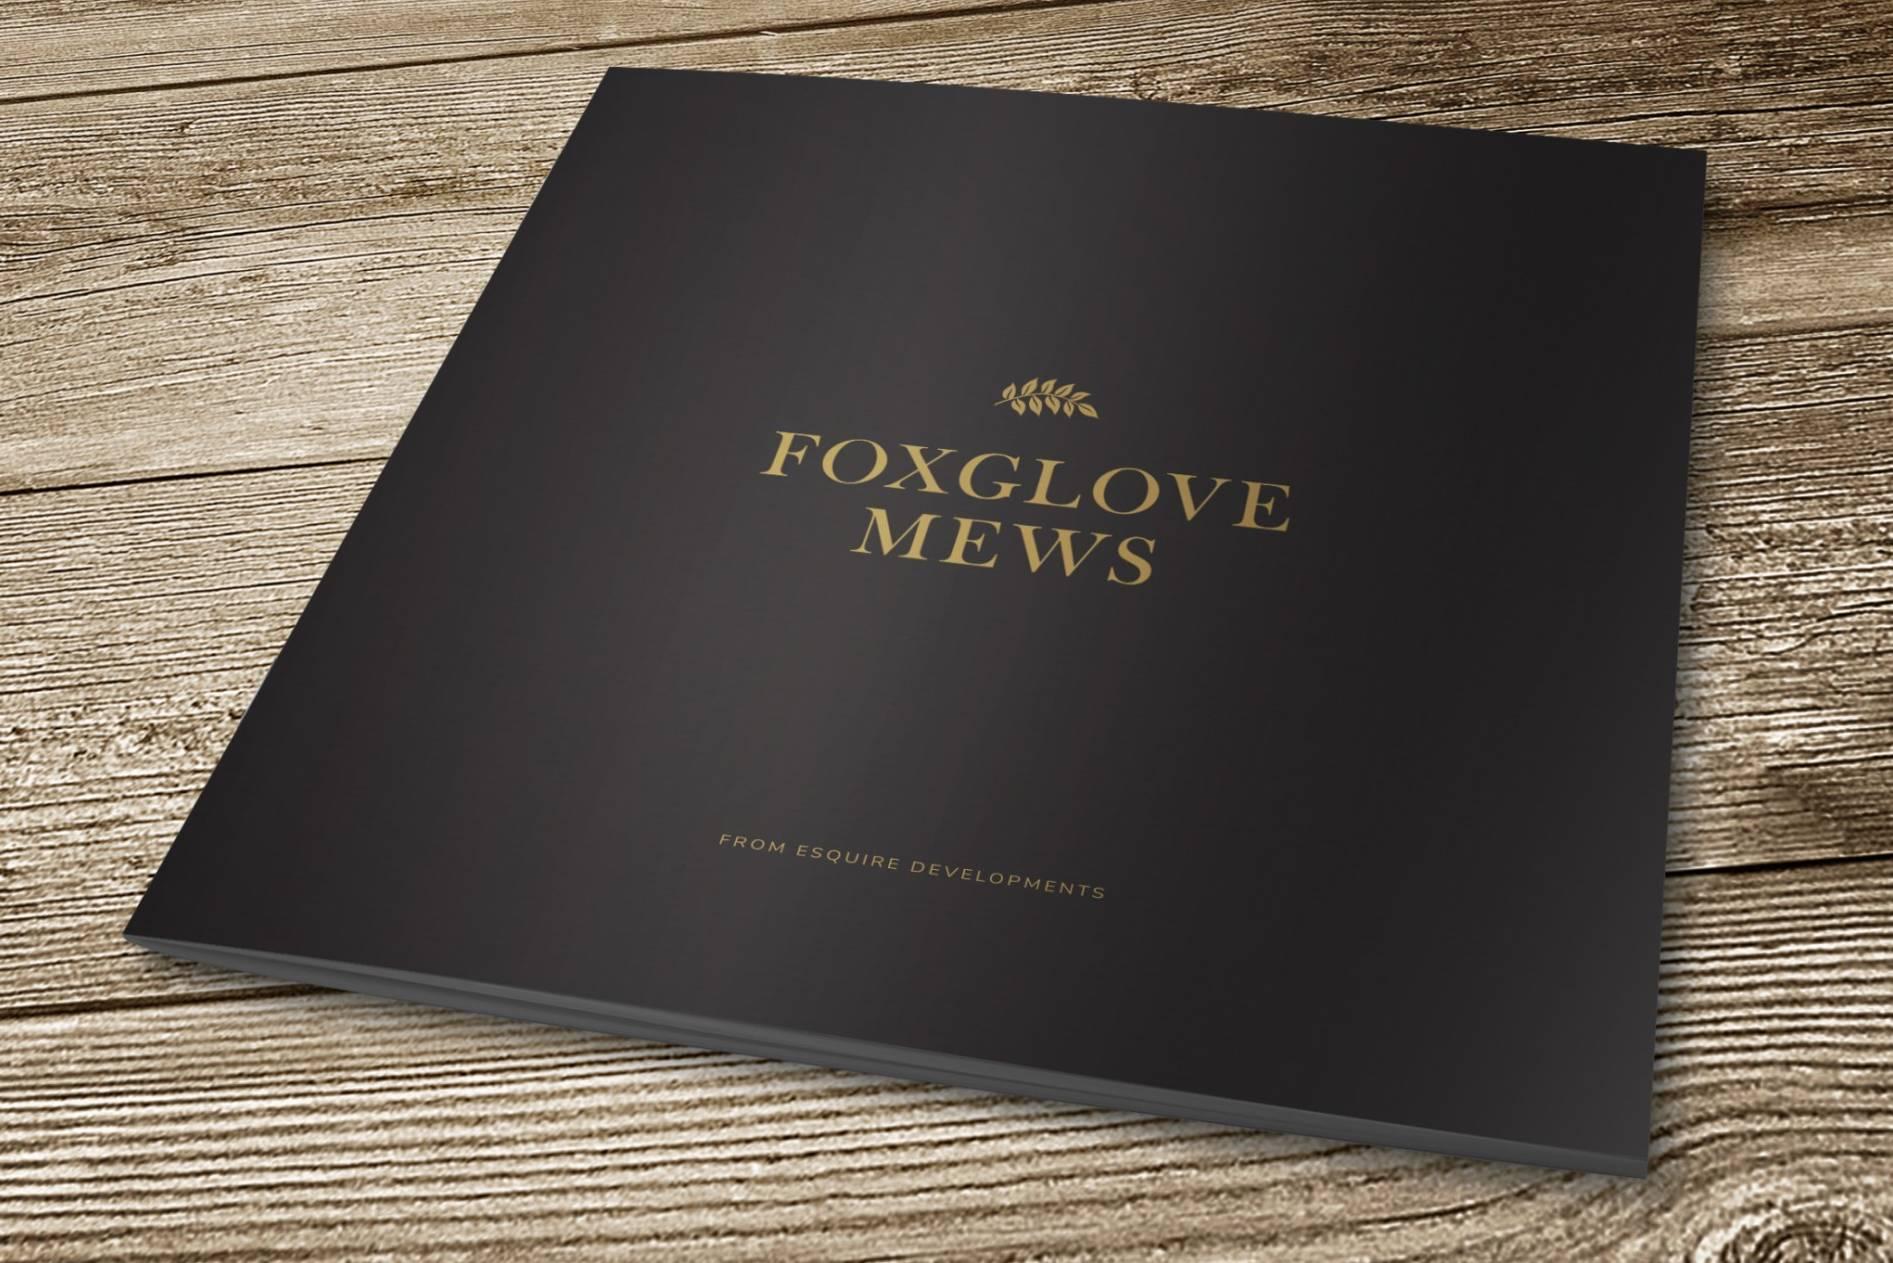 foxglove mews image 01